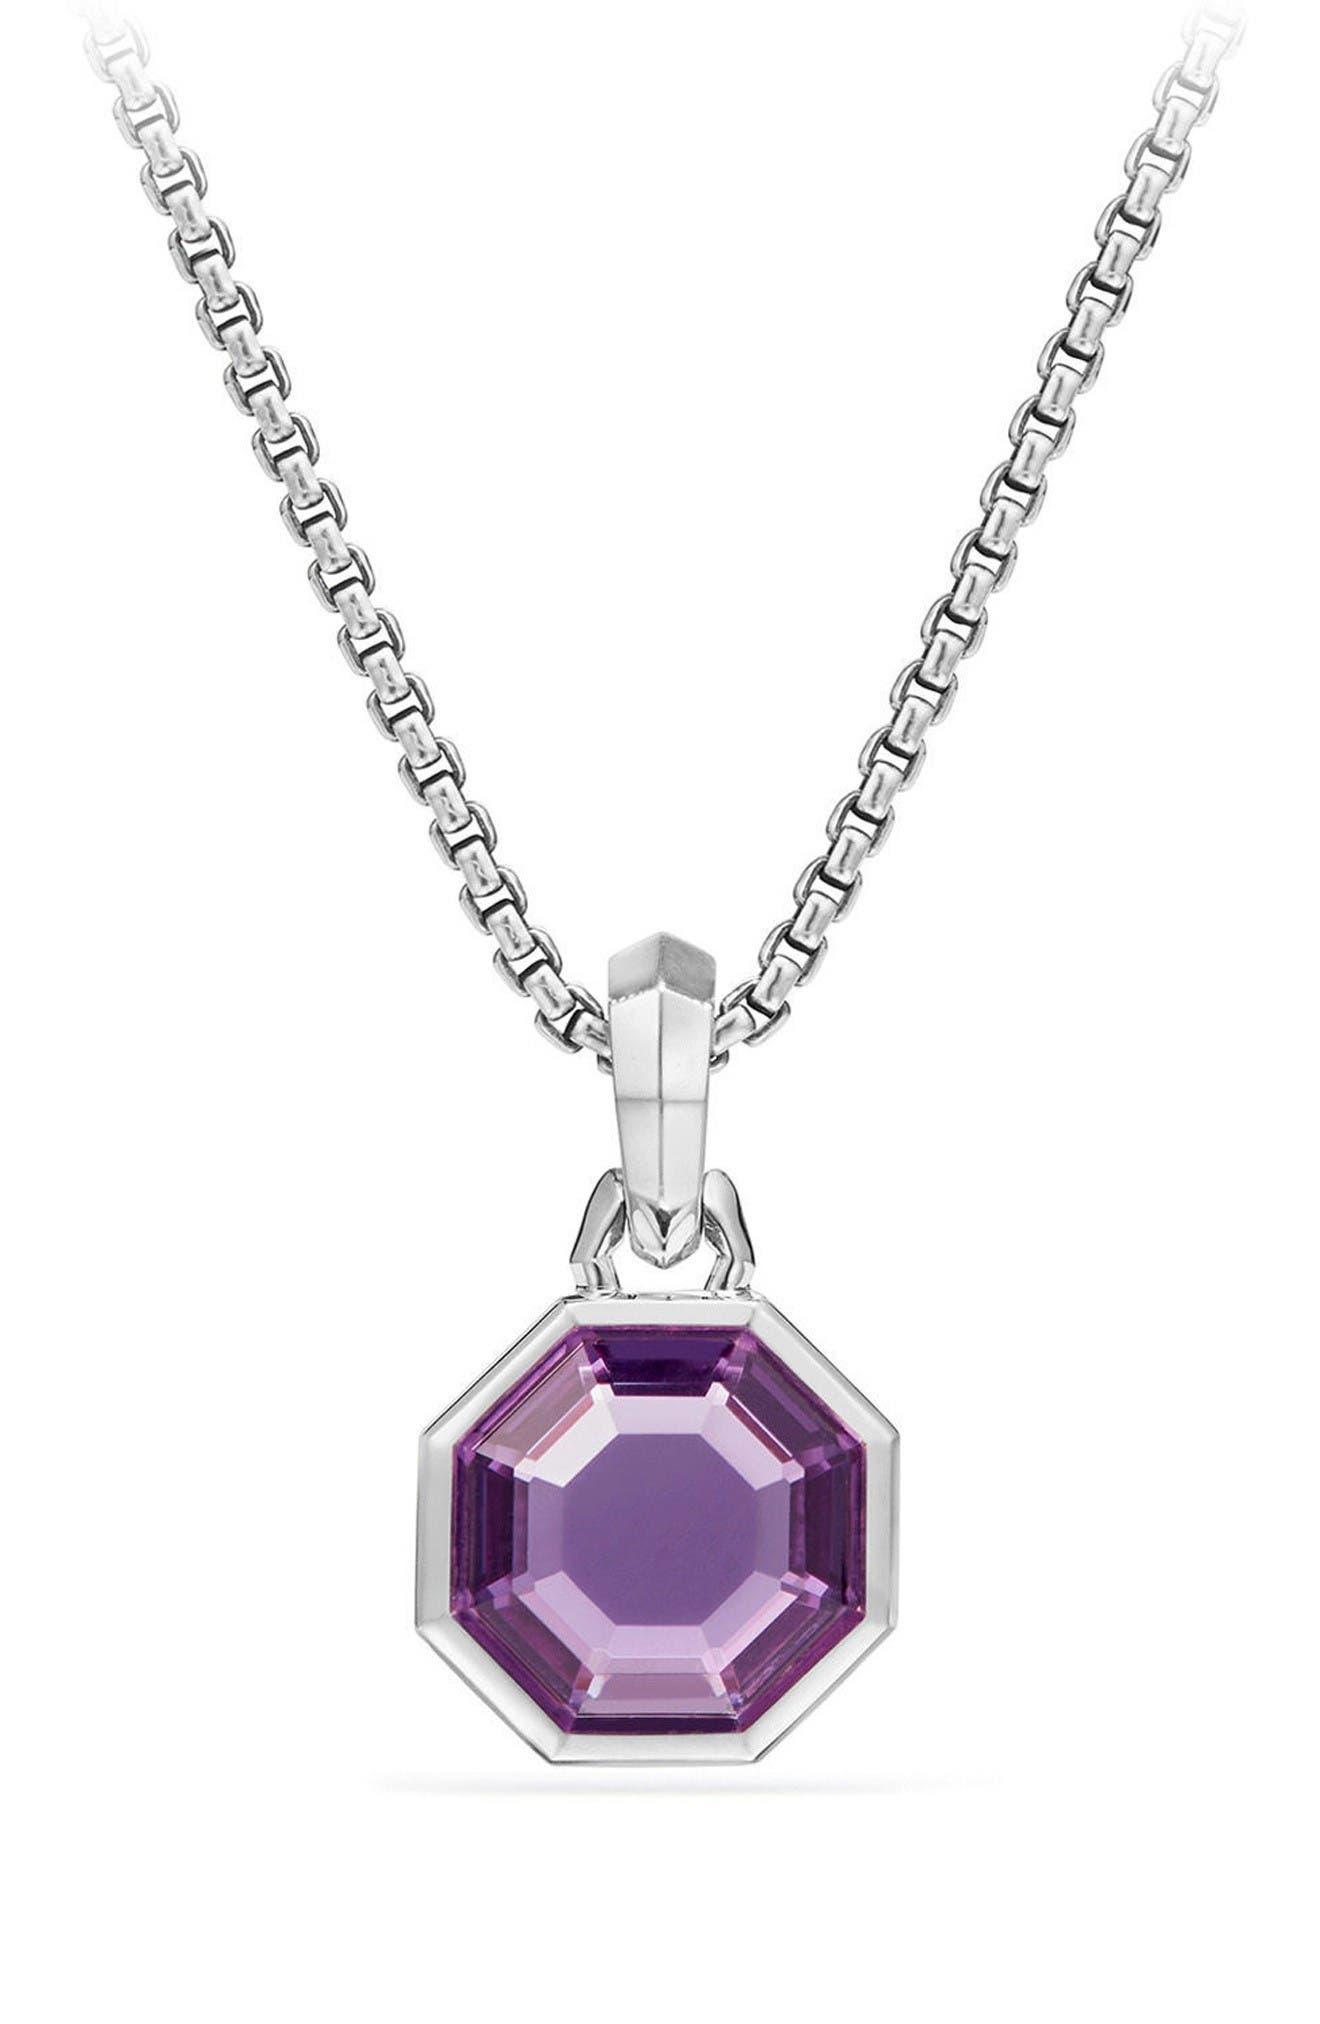 Main Image - David Yurman Cable Collectibles Octagon Cut Semiprecious Stone Amulet